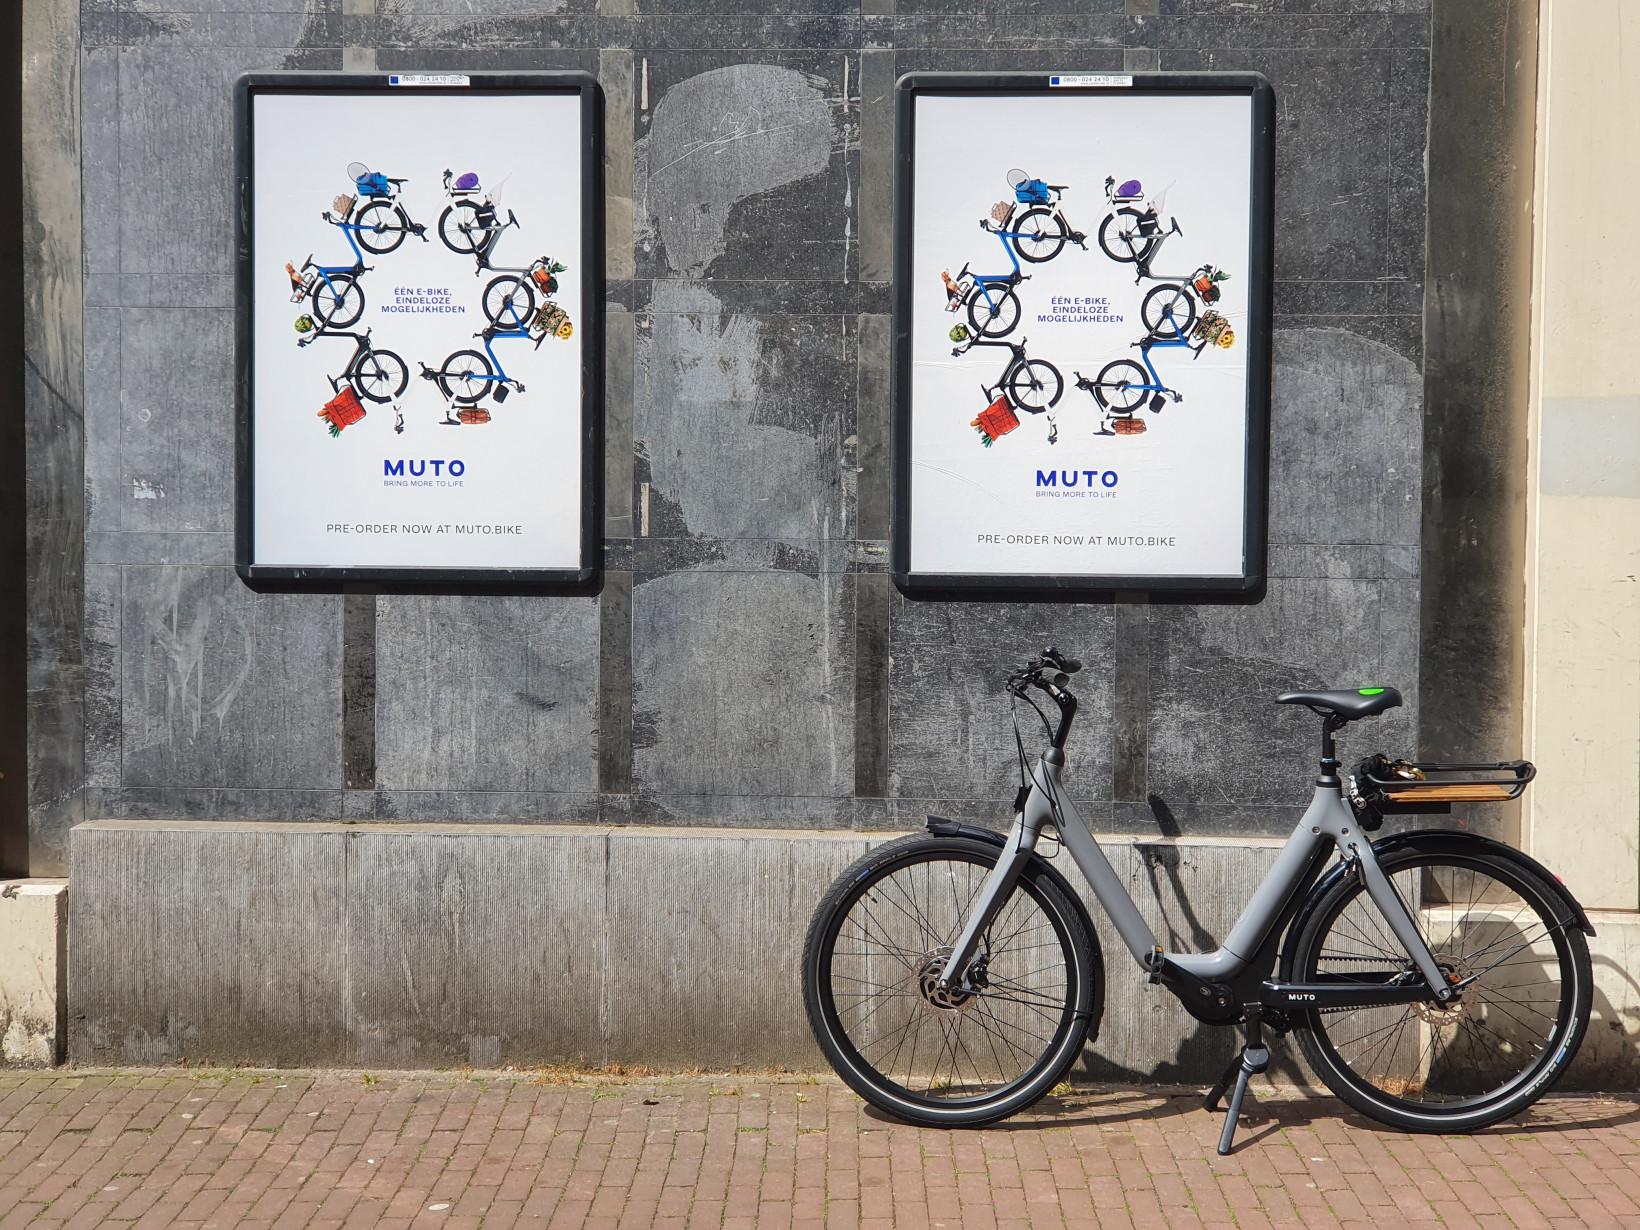 muto, bicicleta eléctrica, revisión, amsterdam